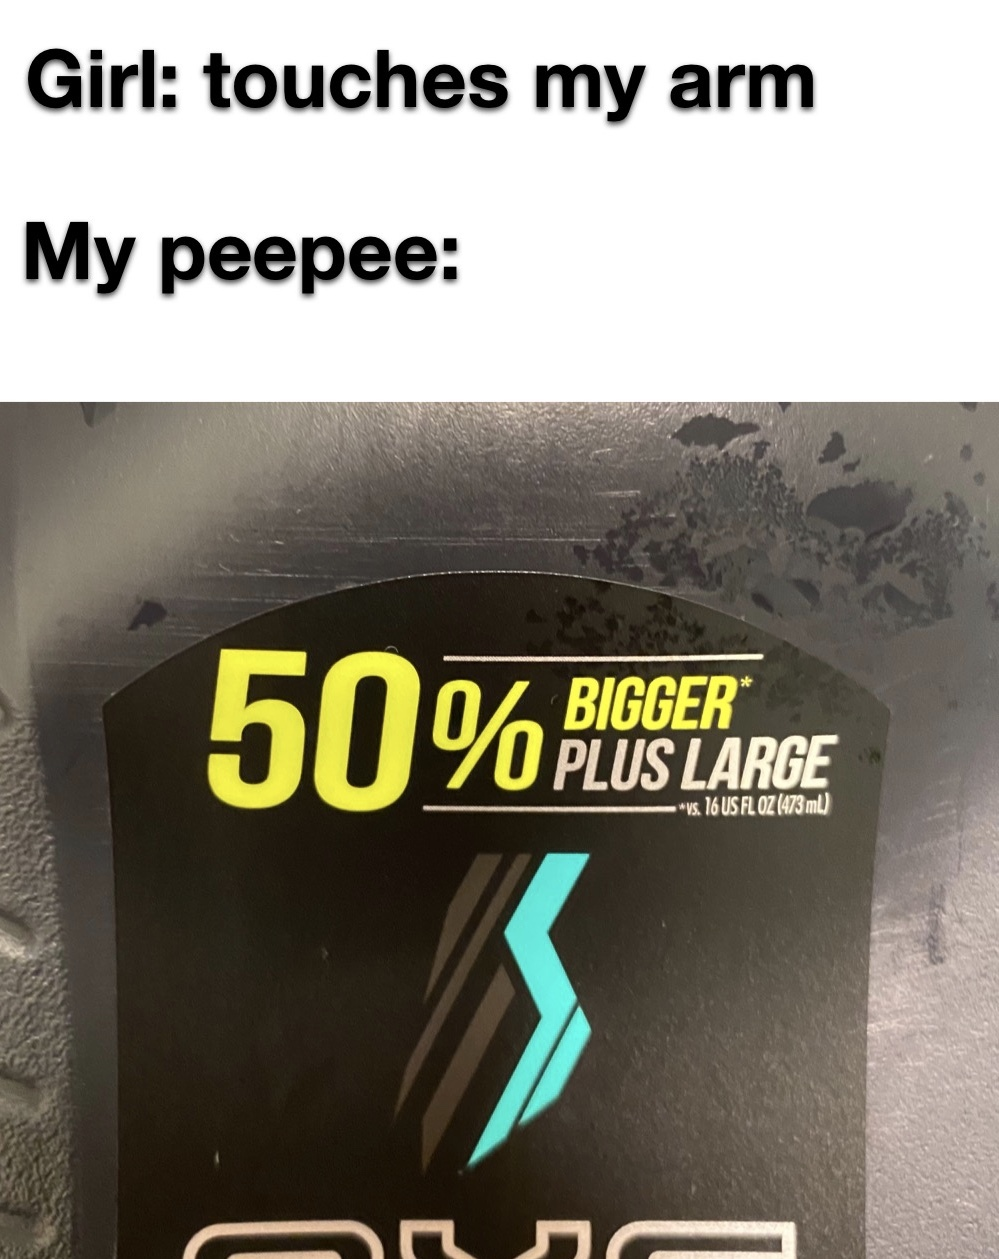 50% bigger plus large - meme